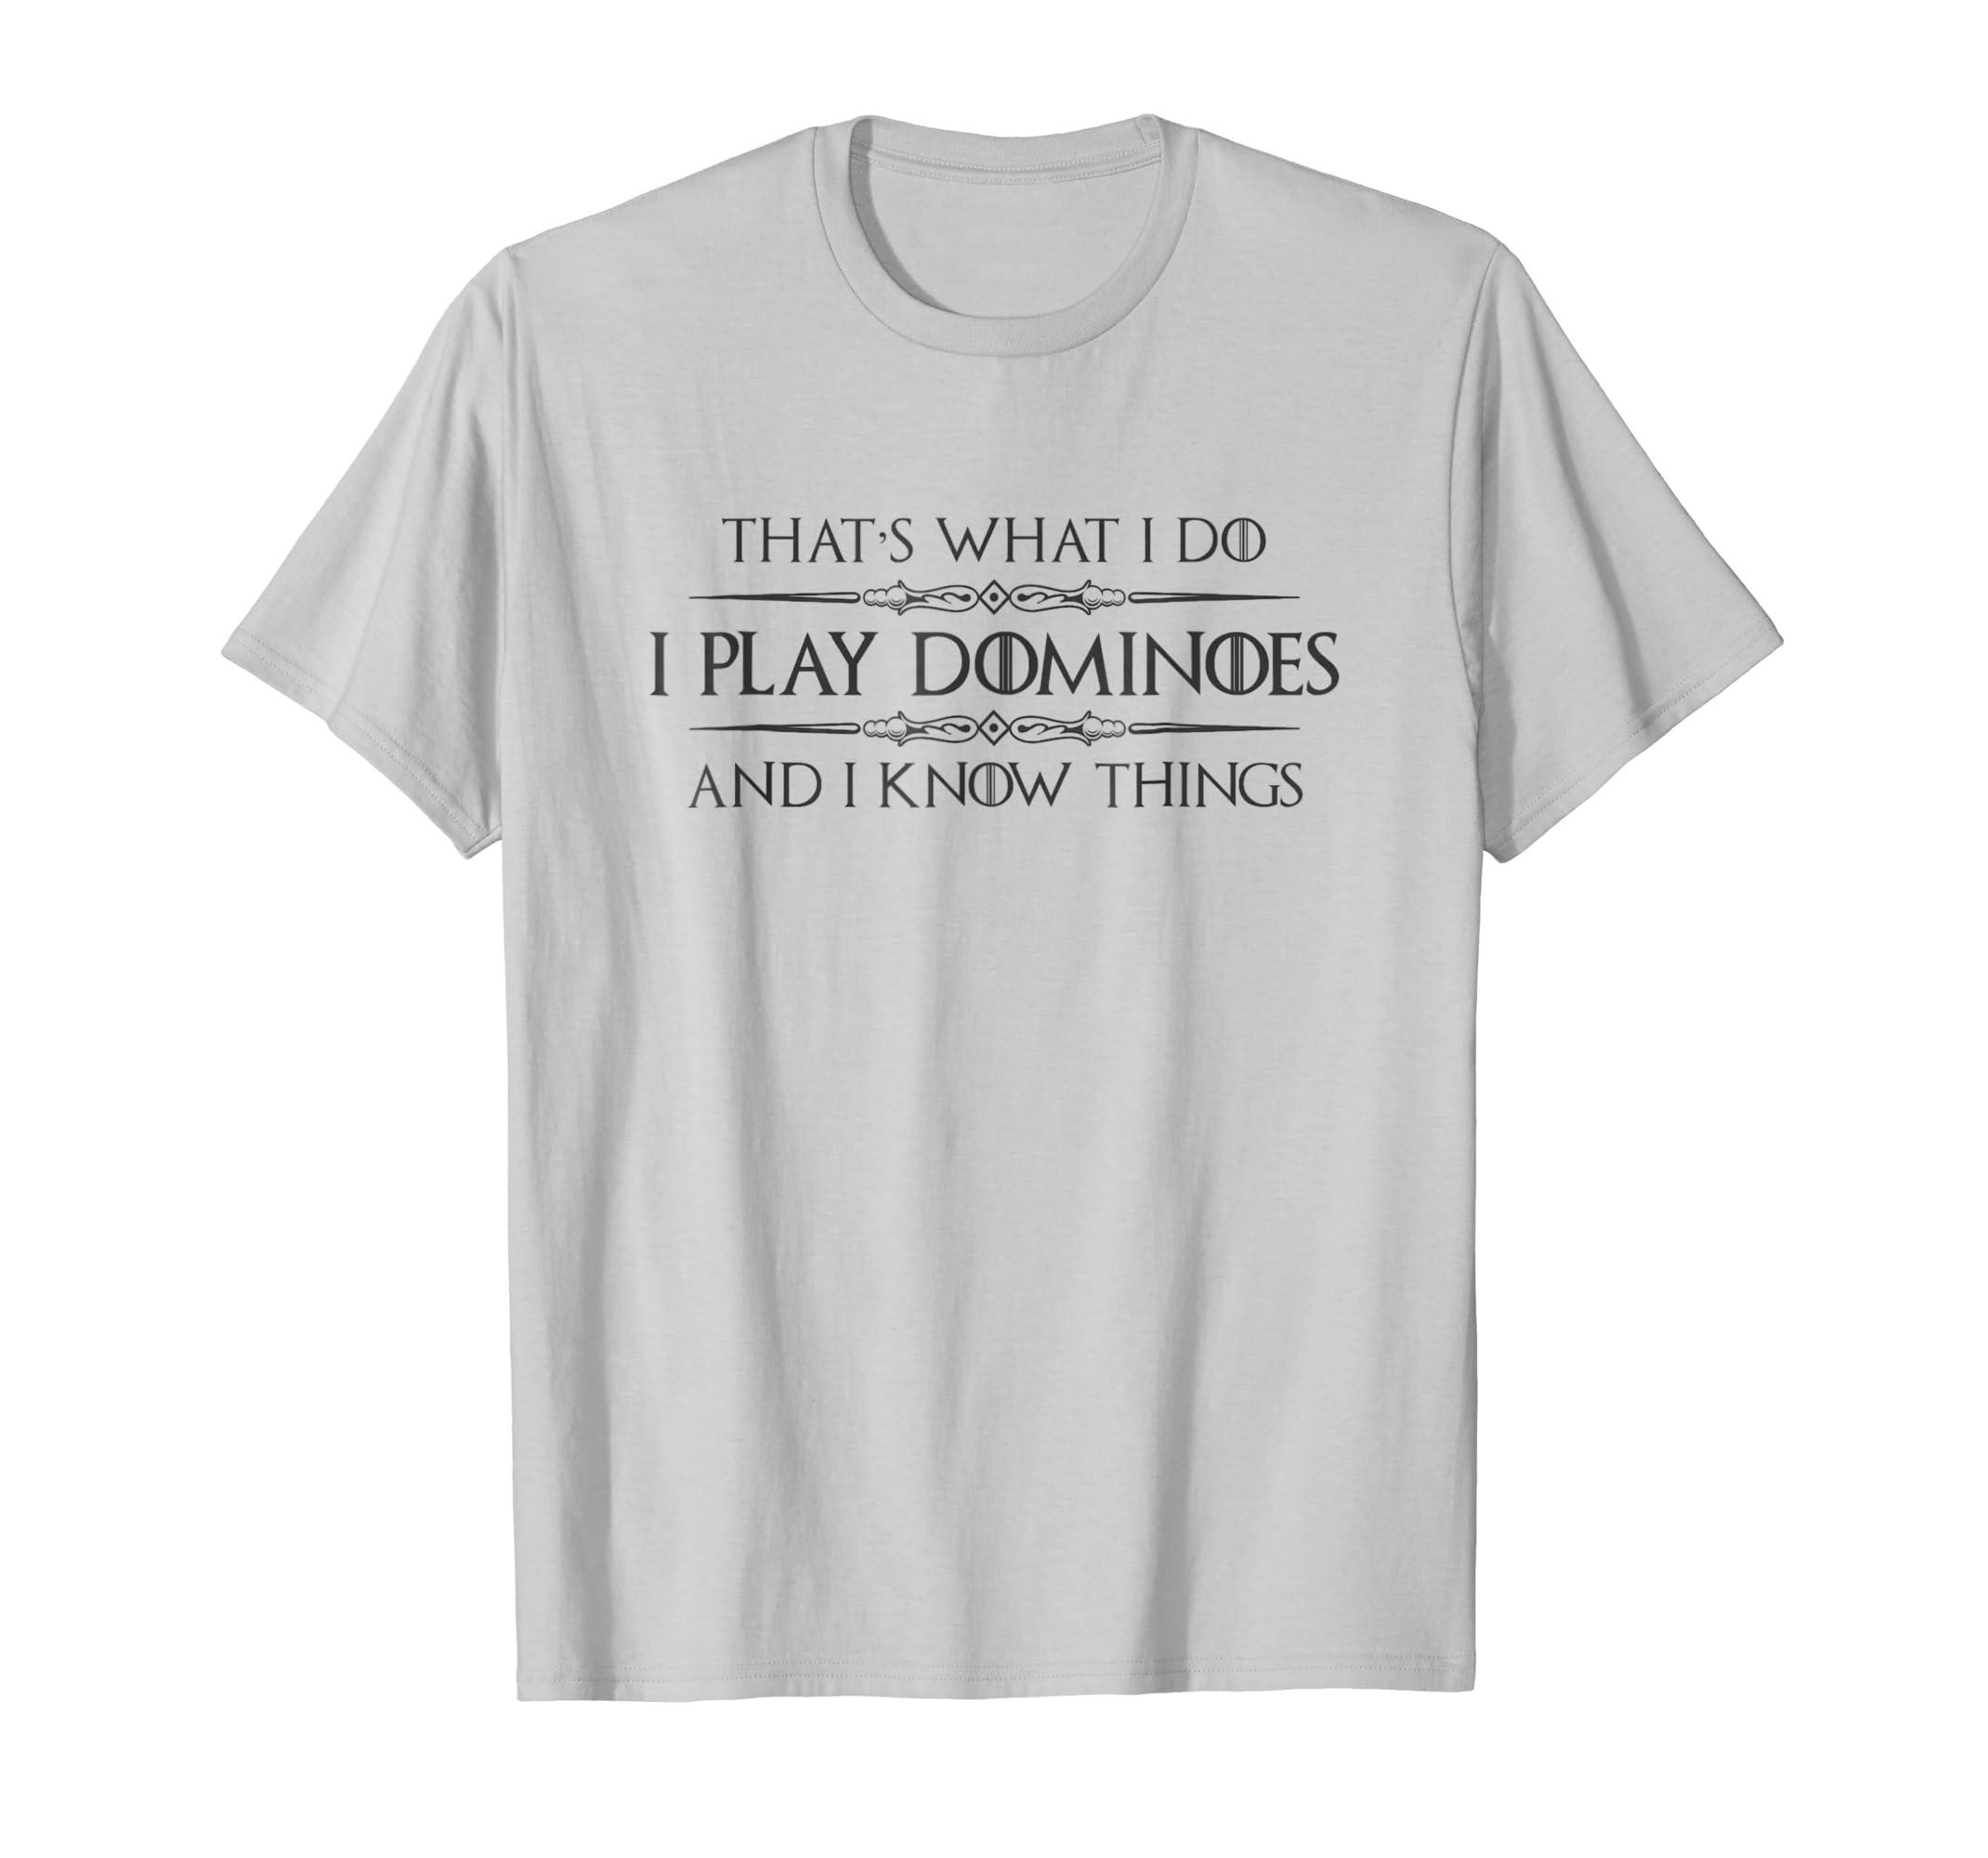 Amazon.com: Dominoes T Shirt - I Play Dominoes & I Know Things ...